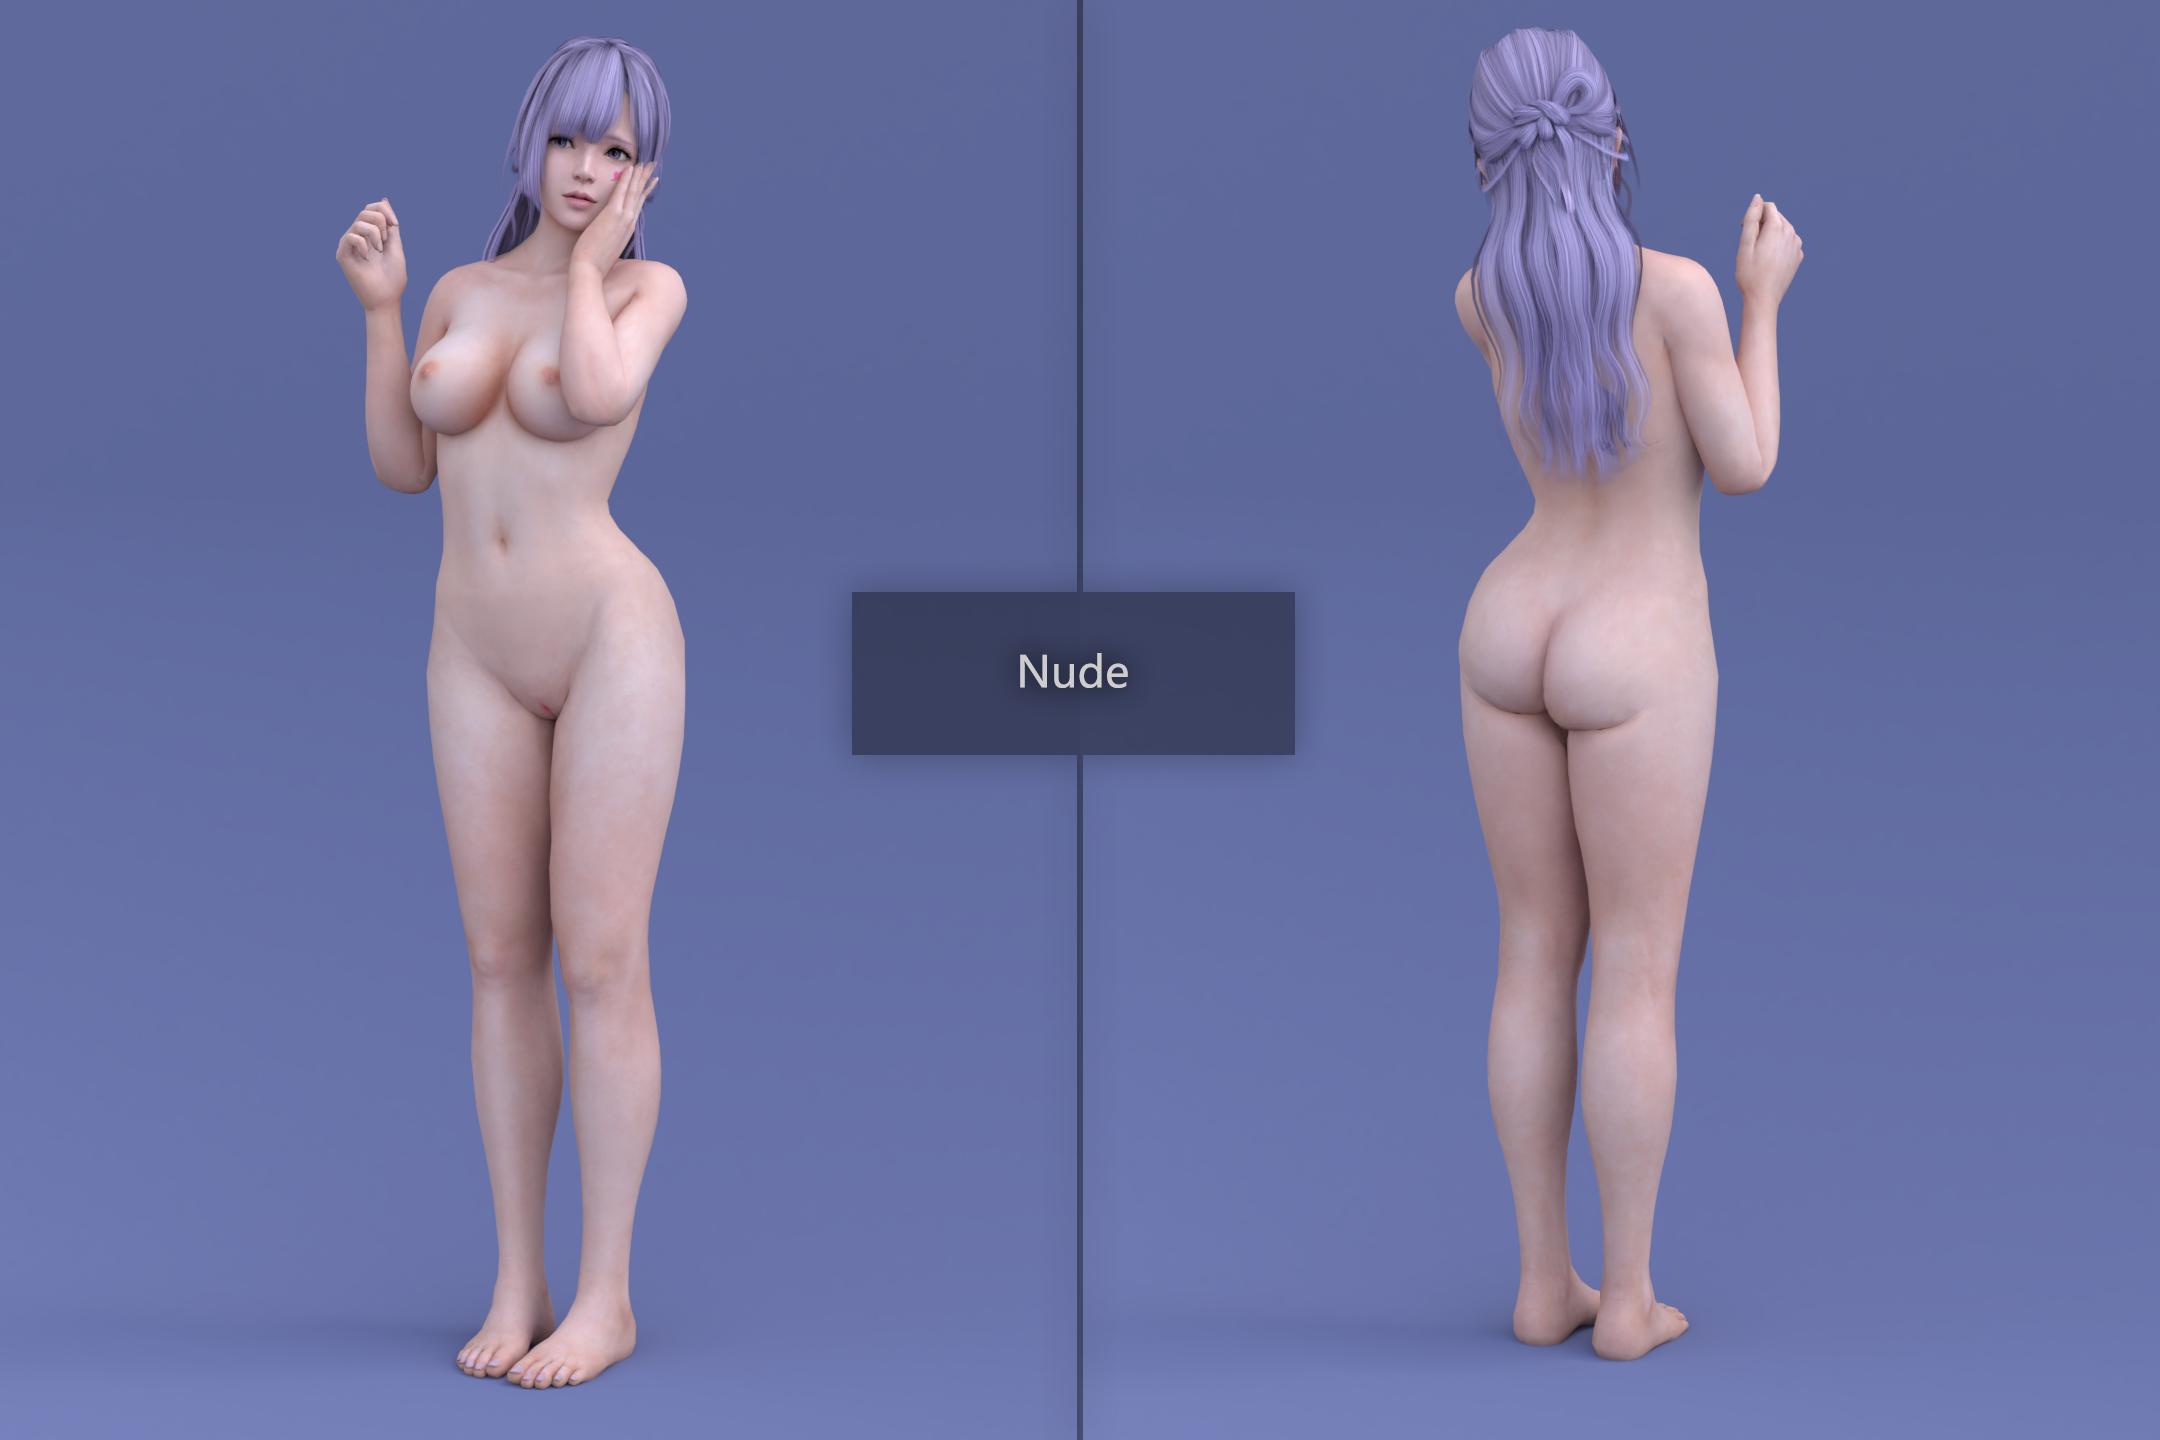 DOAXVV Fiona - Nude [DL]